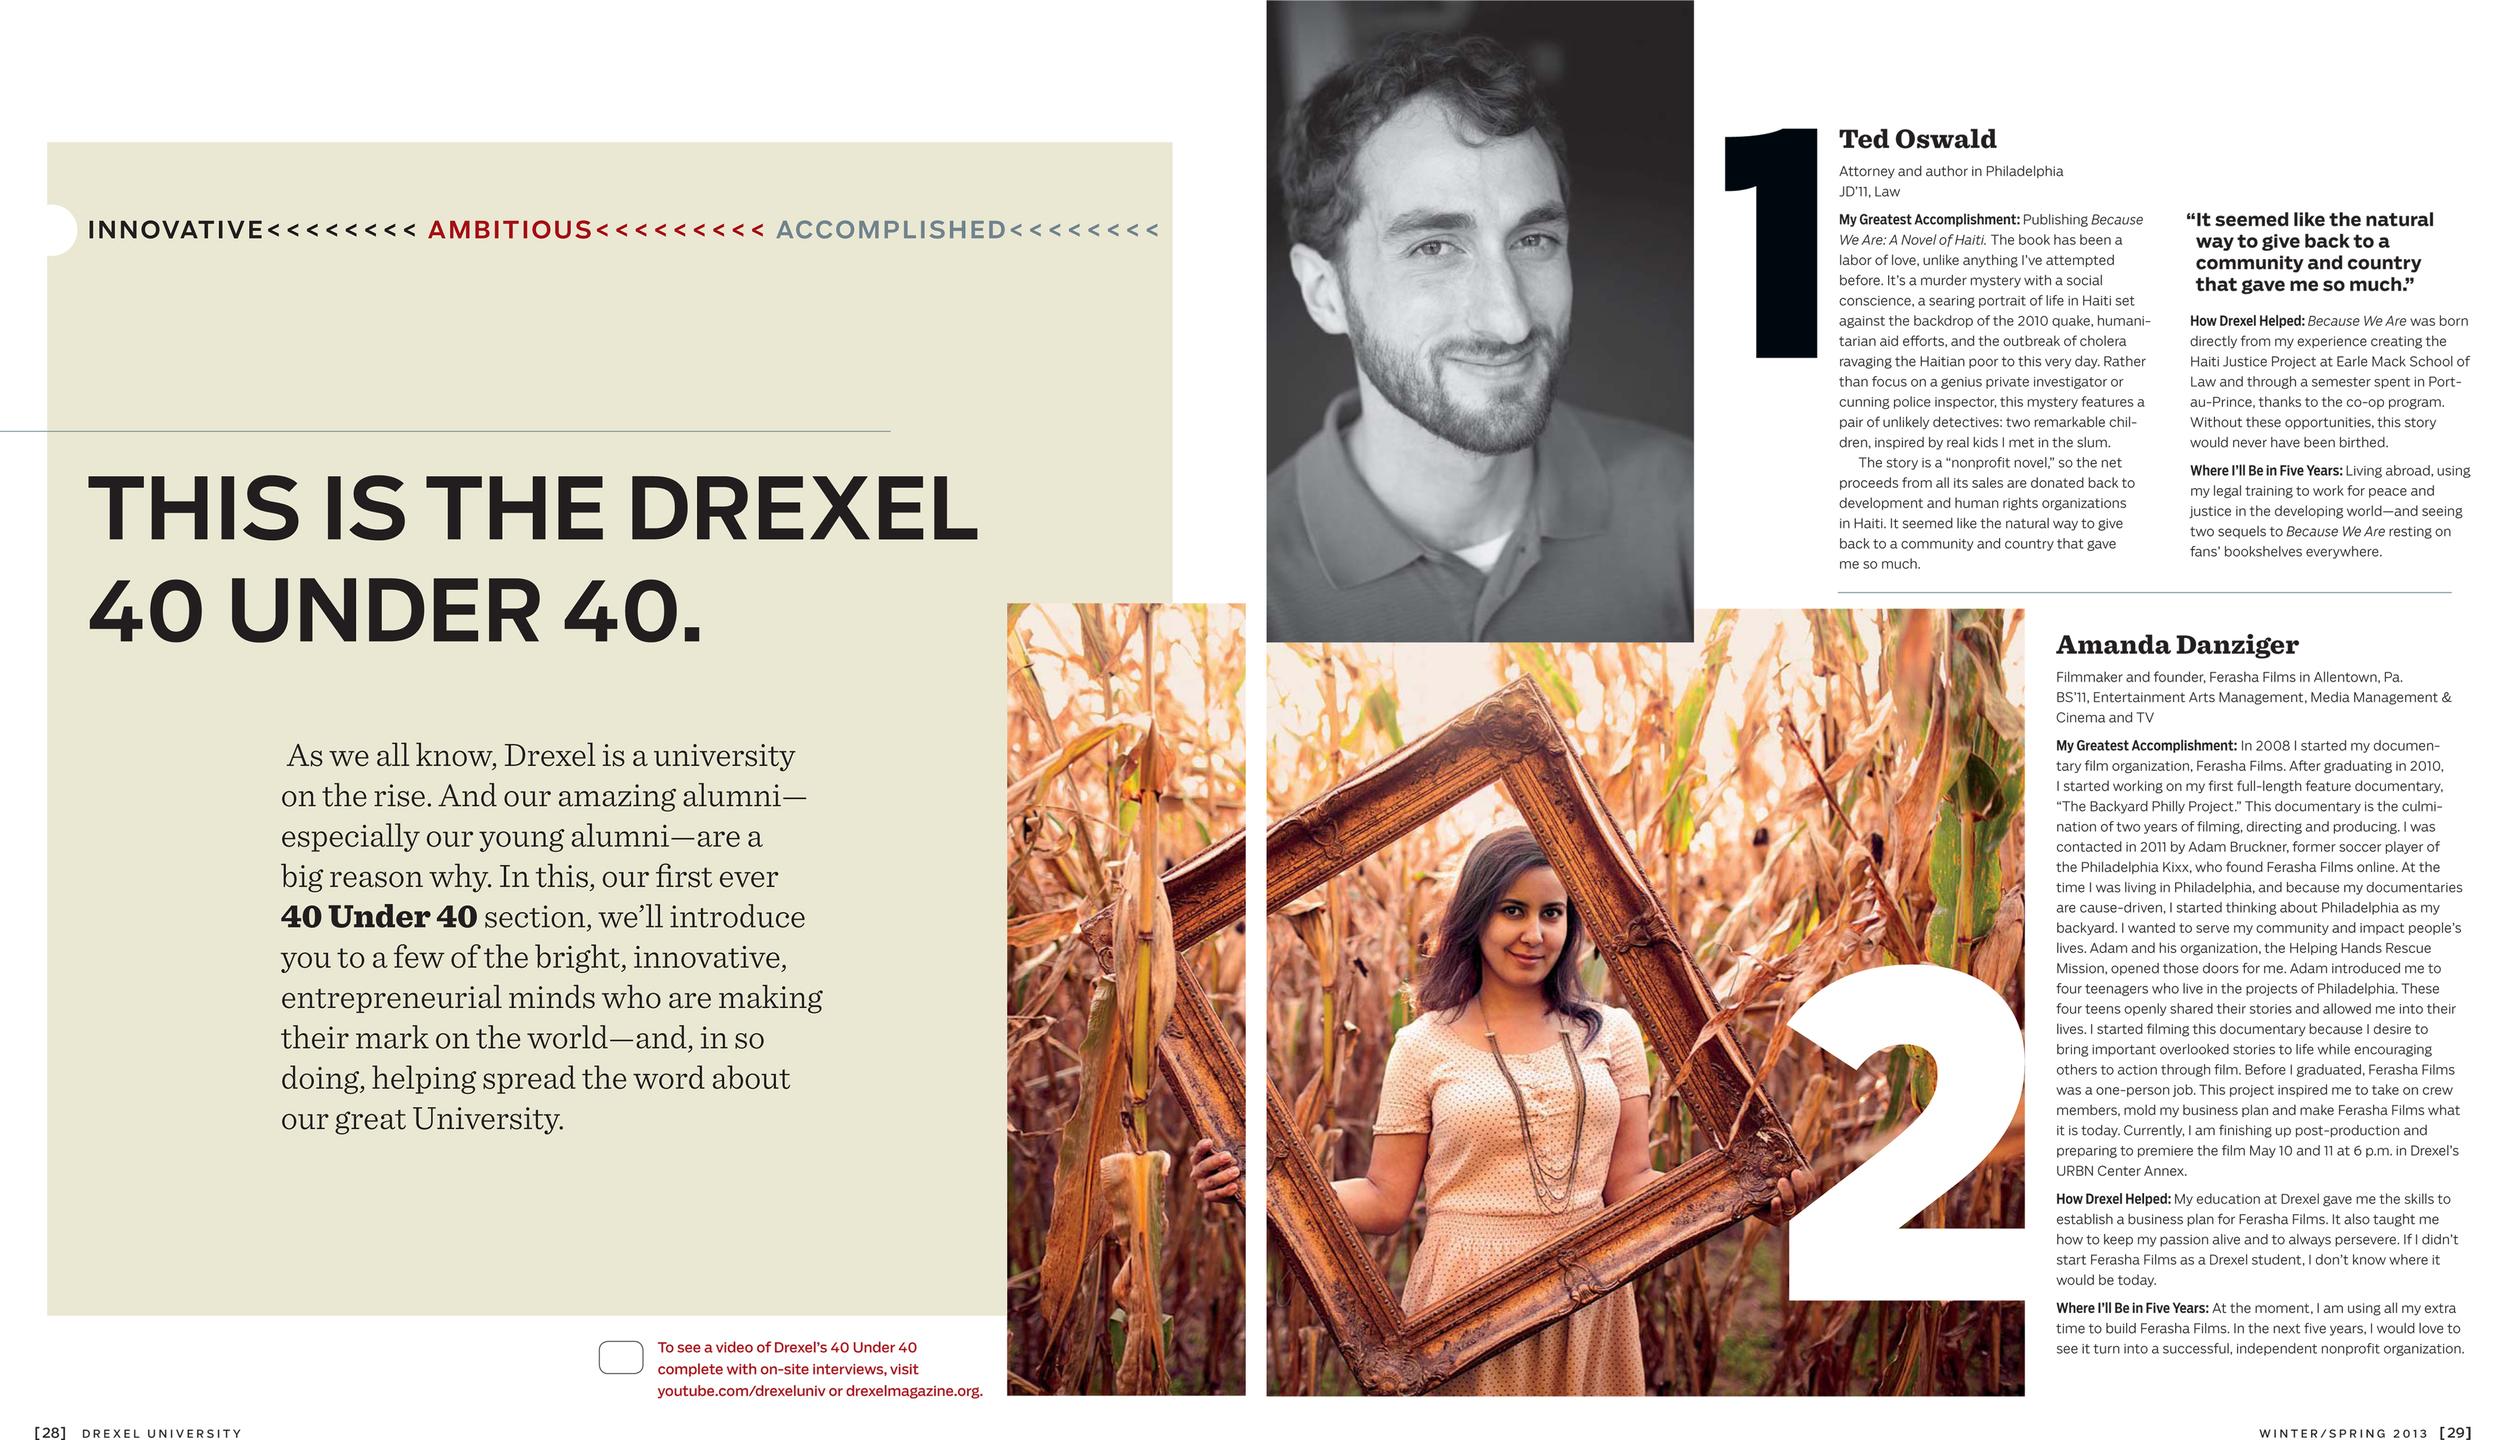 "Amanda Danziger, founder and filmmaker, featured in Drexel Magazine's ""40 under 40."" Winter 2013."